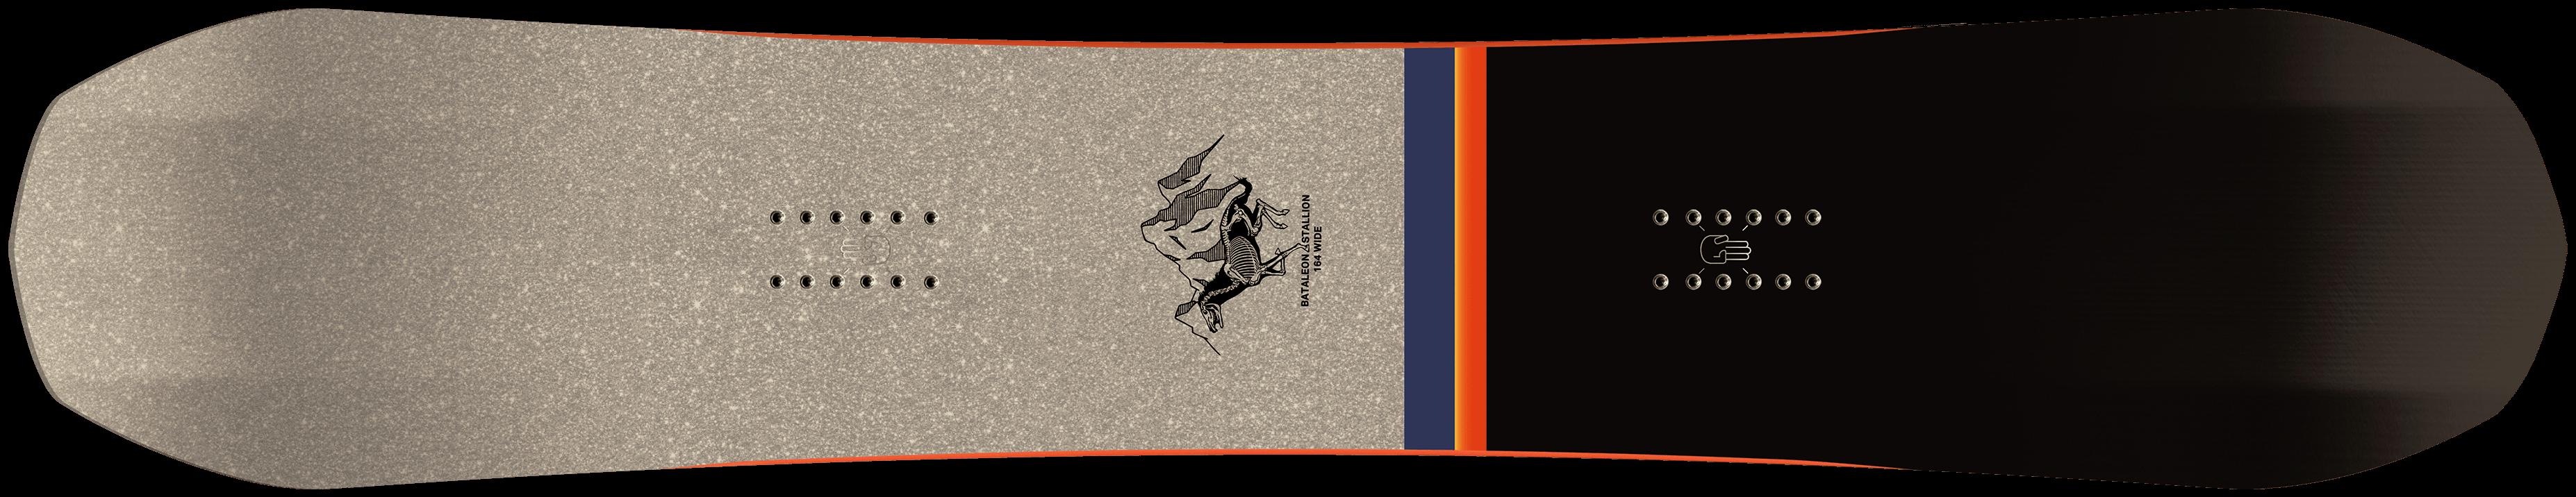 1718_stallion_top_web.png